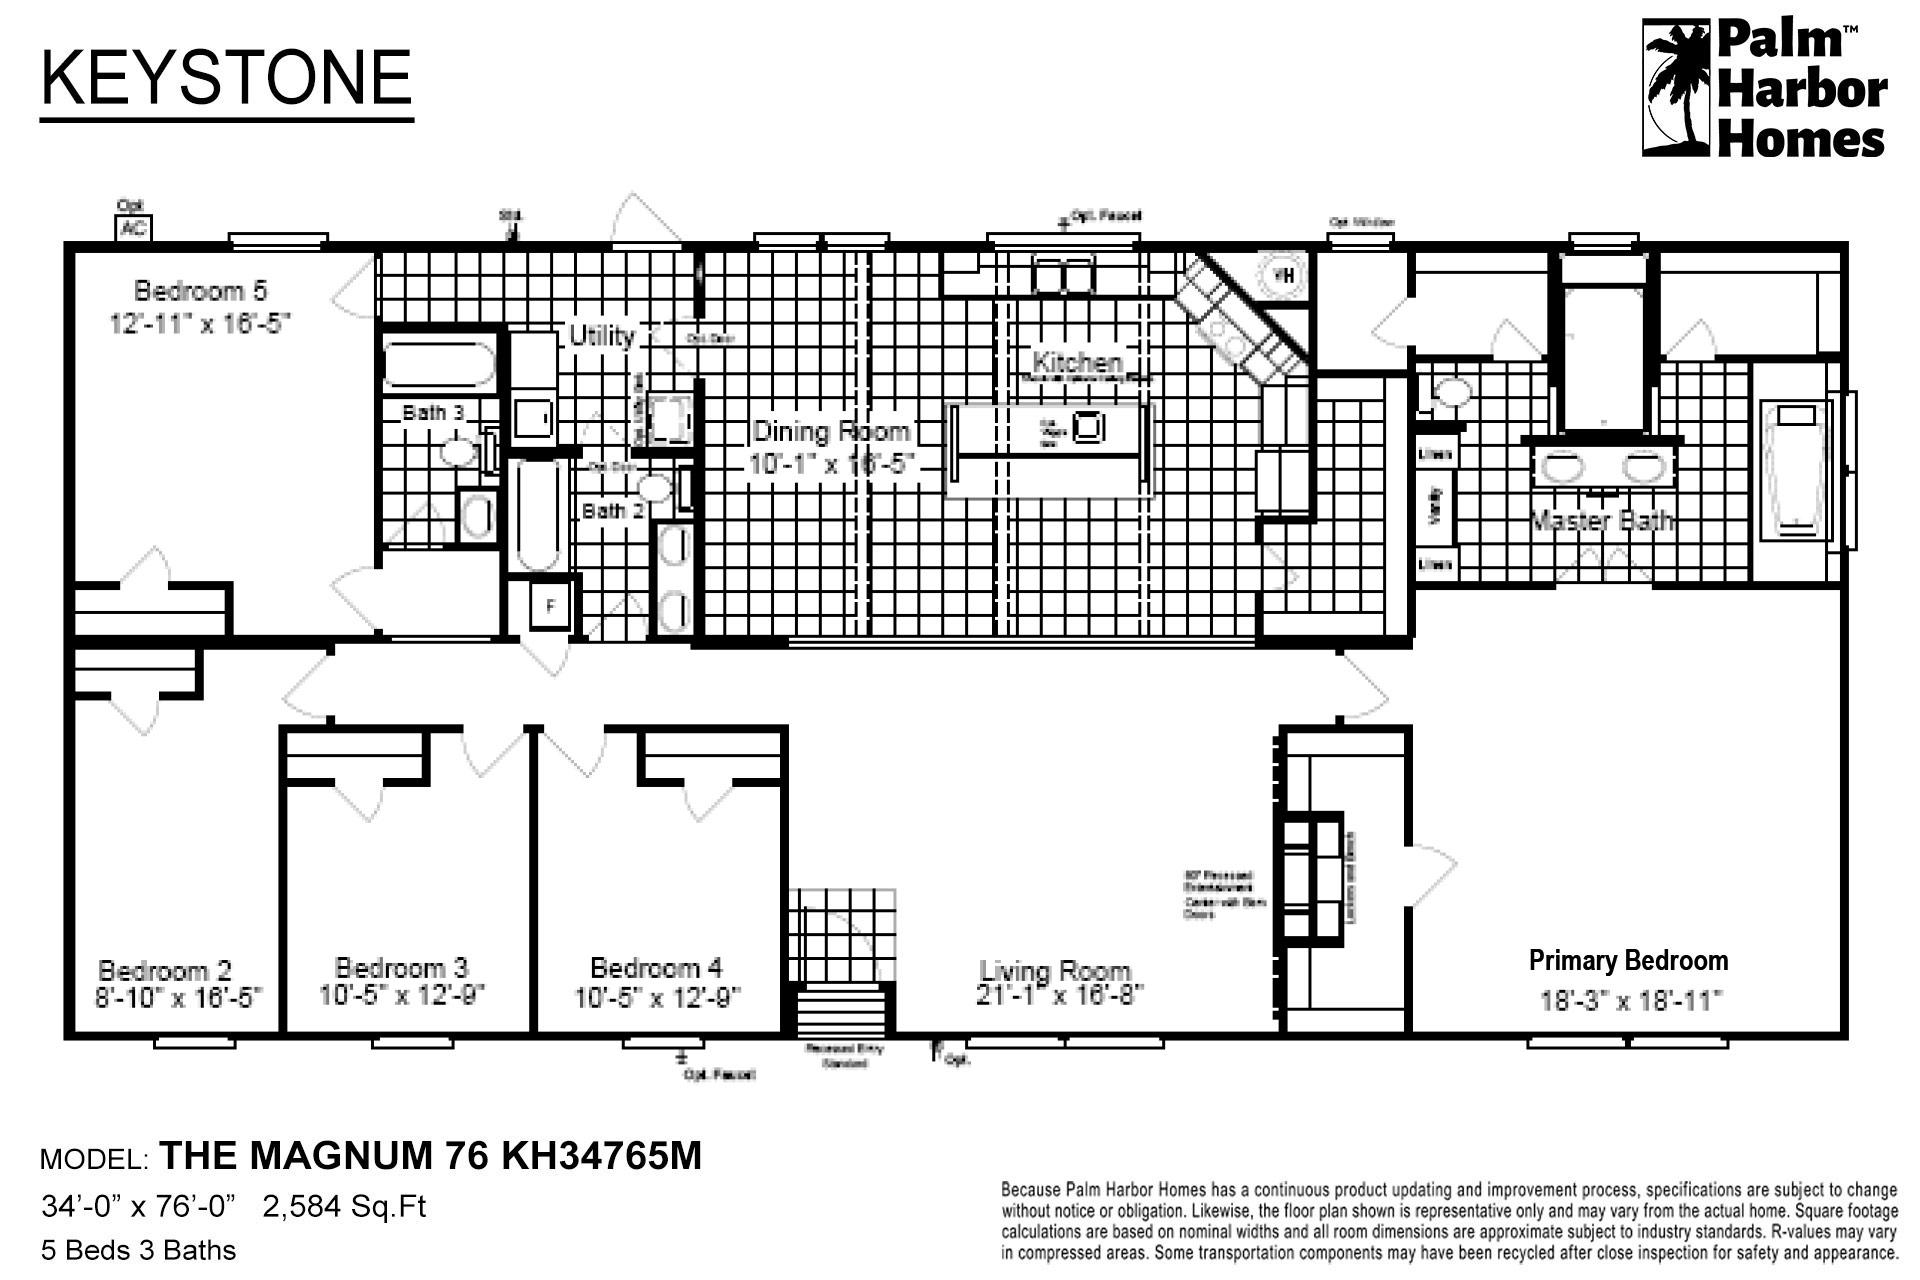 Keystone - The Magnum 76 KH34765M